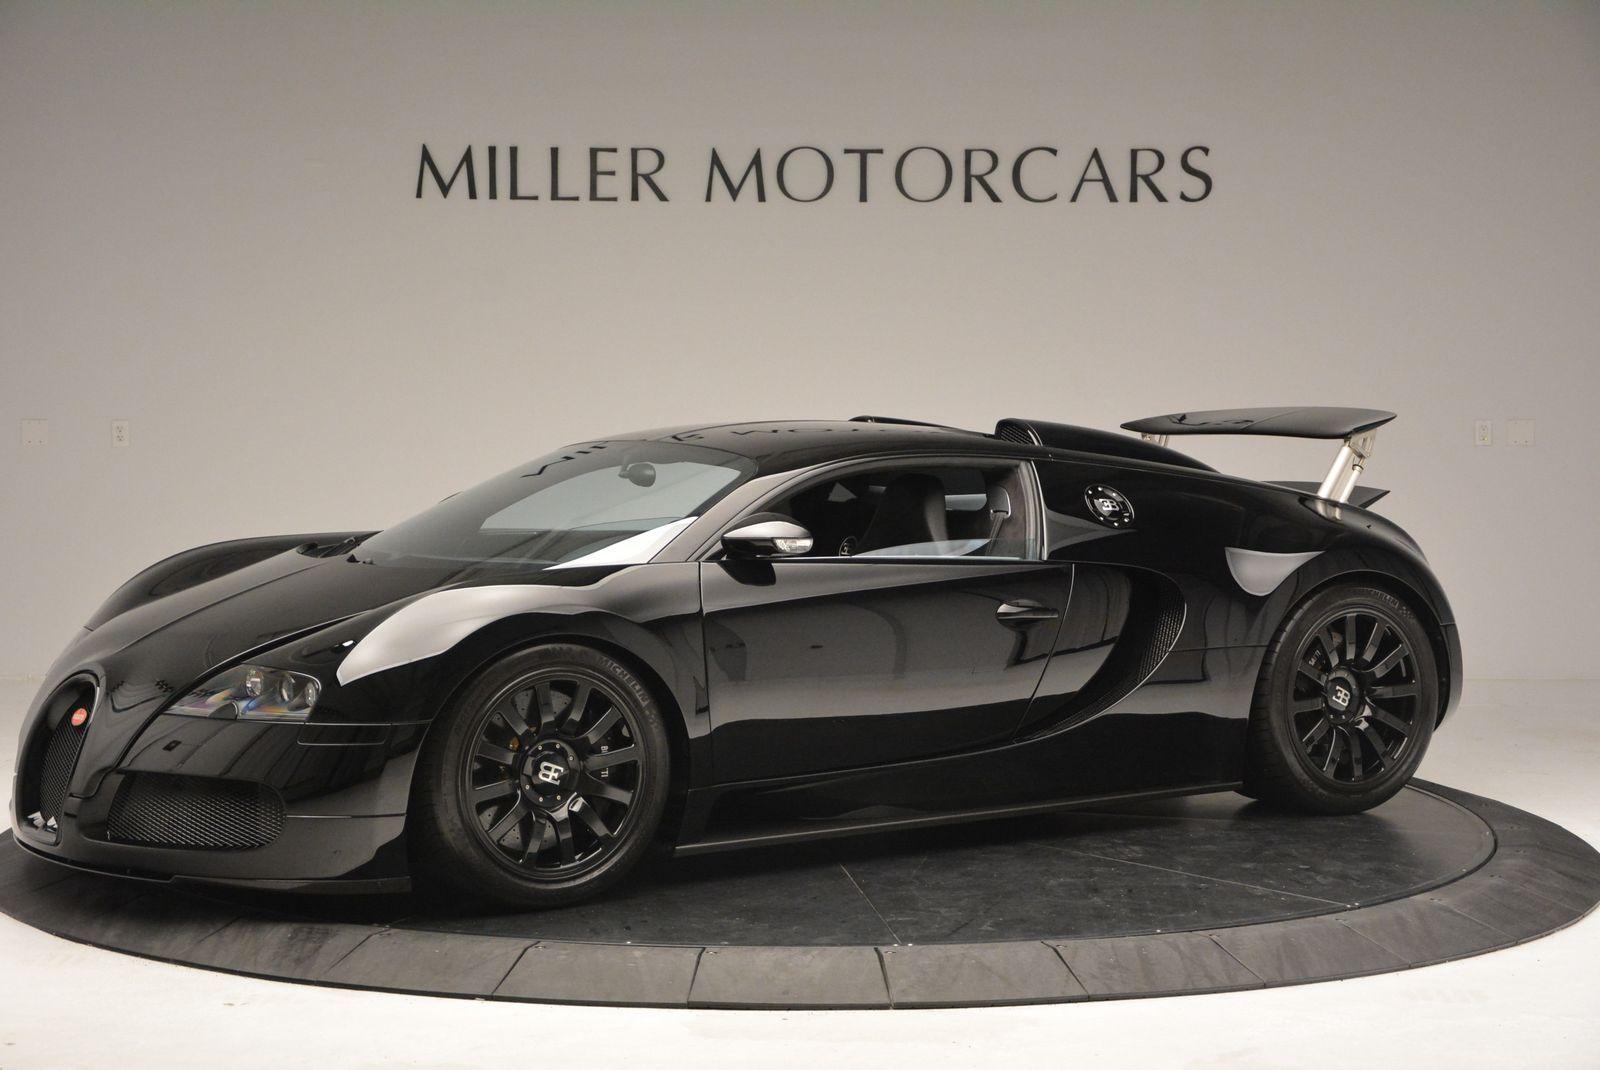 Foto Divers Black Bugatti Veyron Black Bugatti Veyron Occasion 003 Bugatti Veyron Bugatti Veyron 16 Veyron